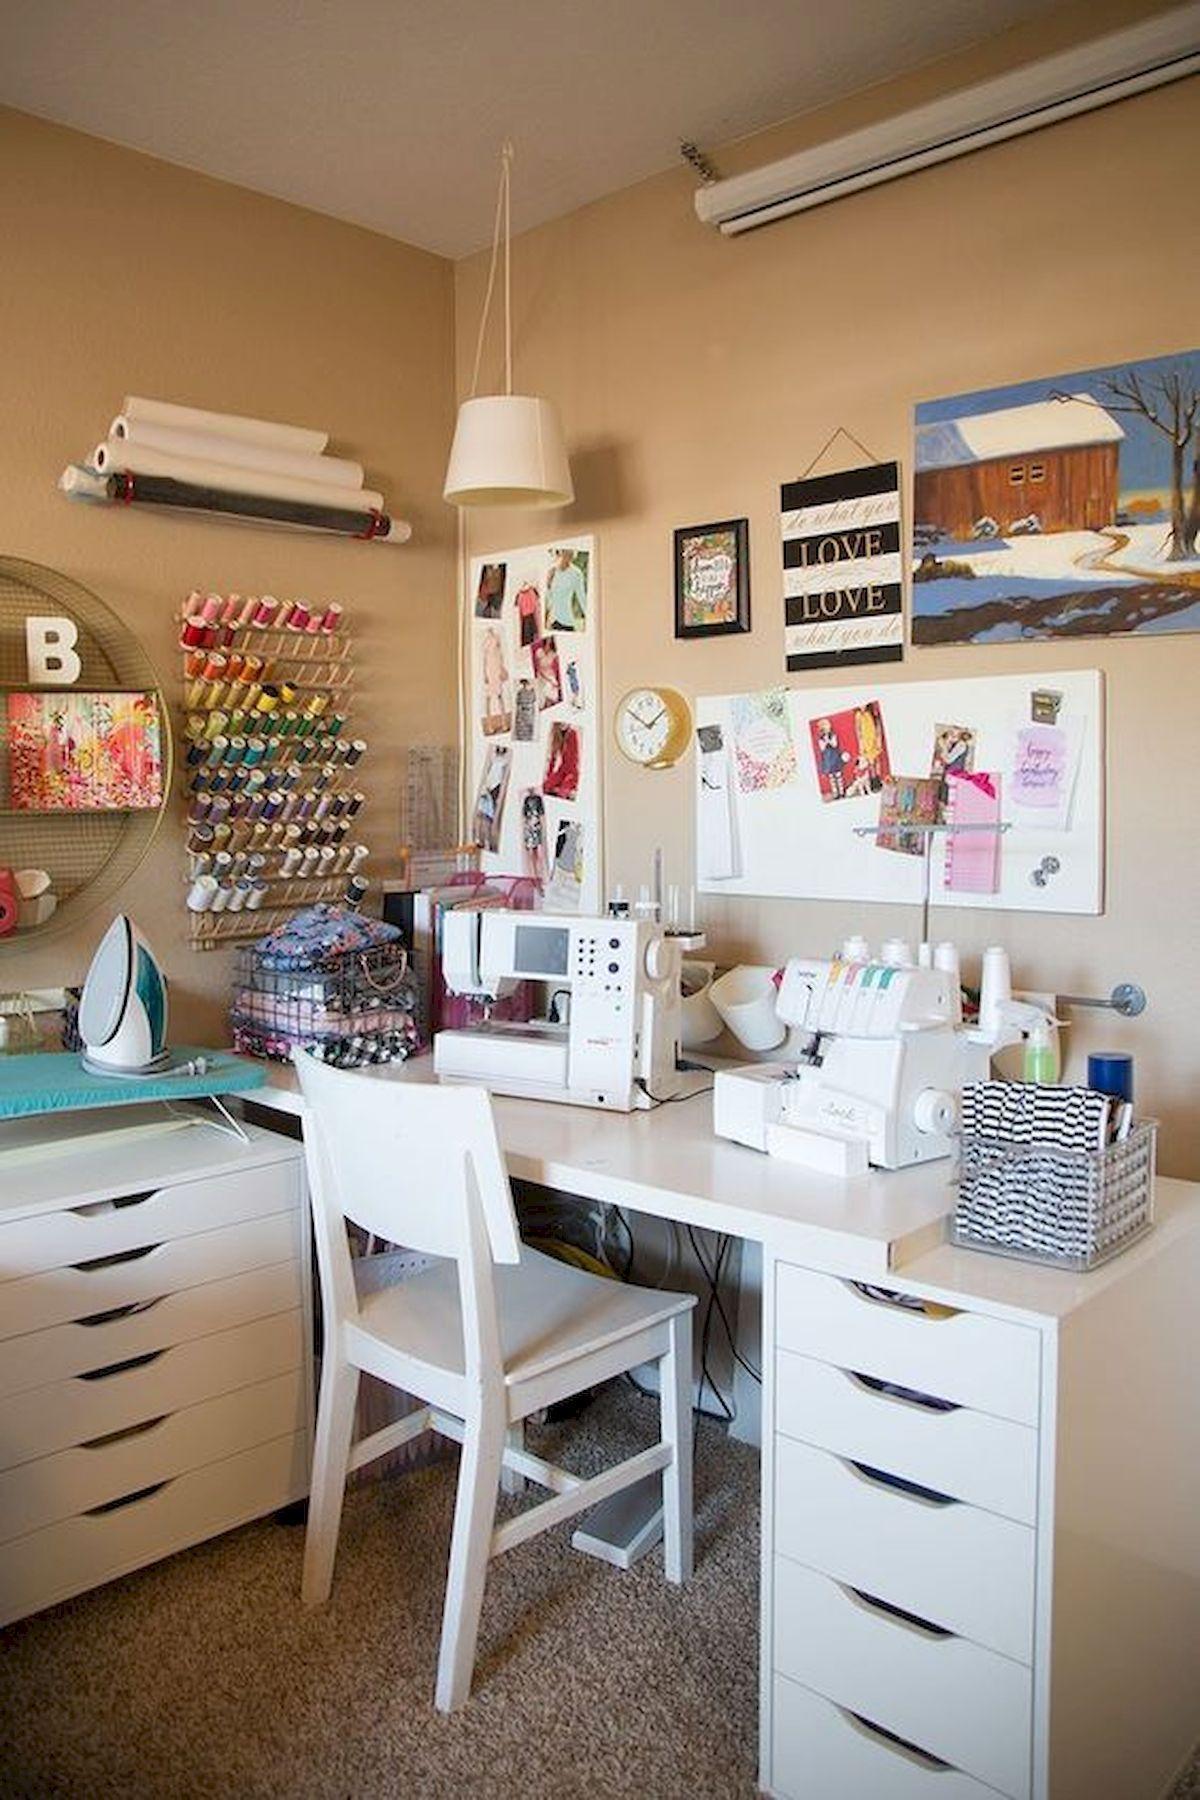 30 Artsy Craft Room Ideas And Decorations 26 Artmyideas